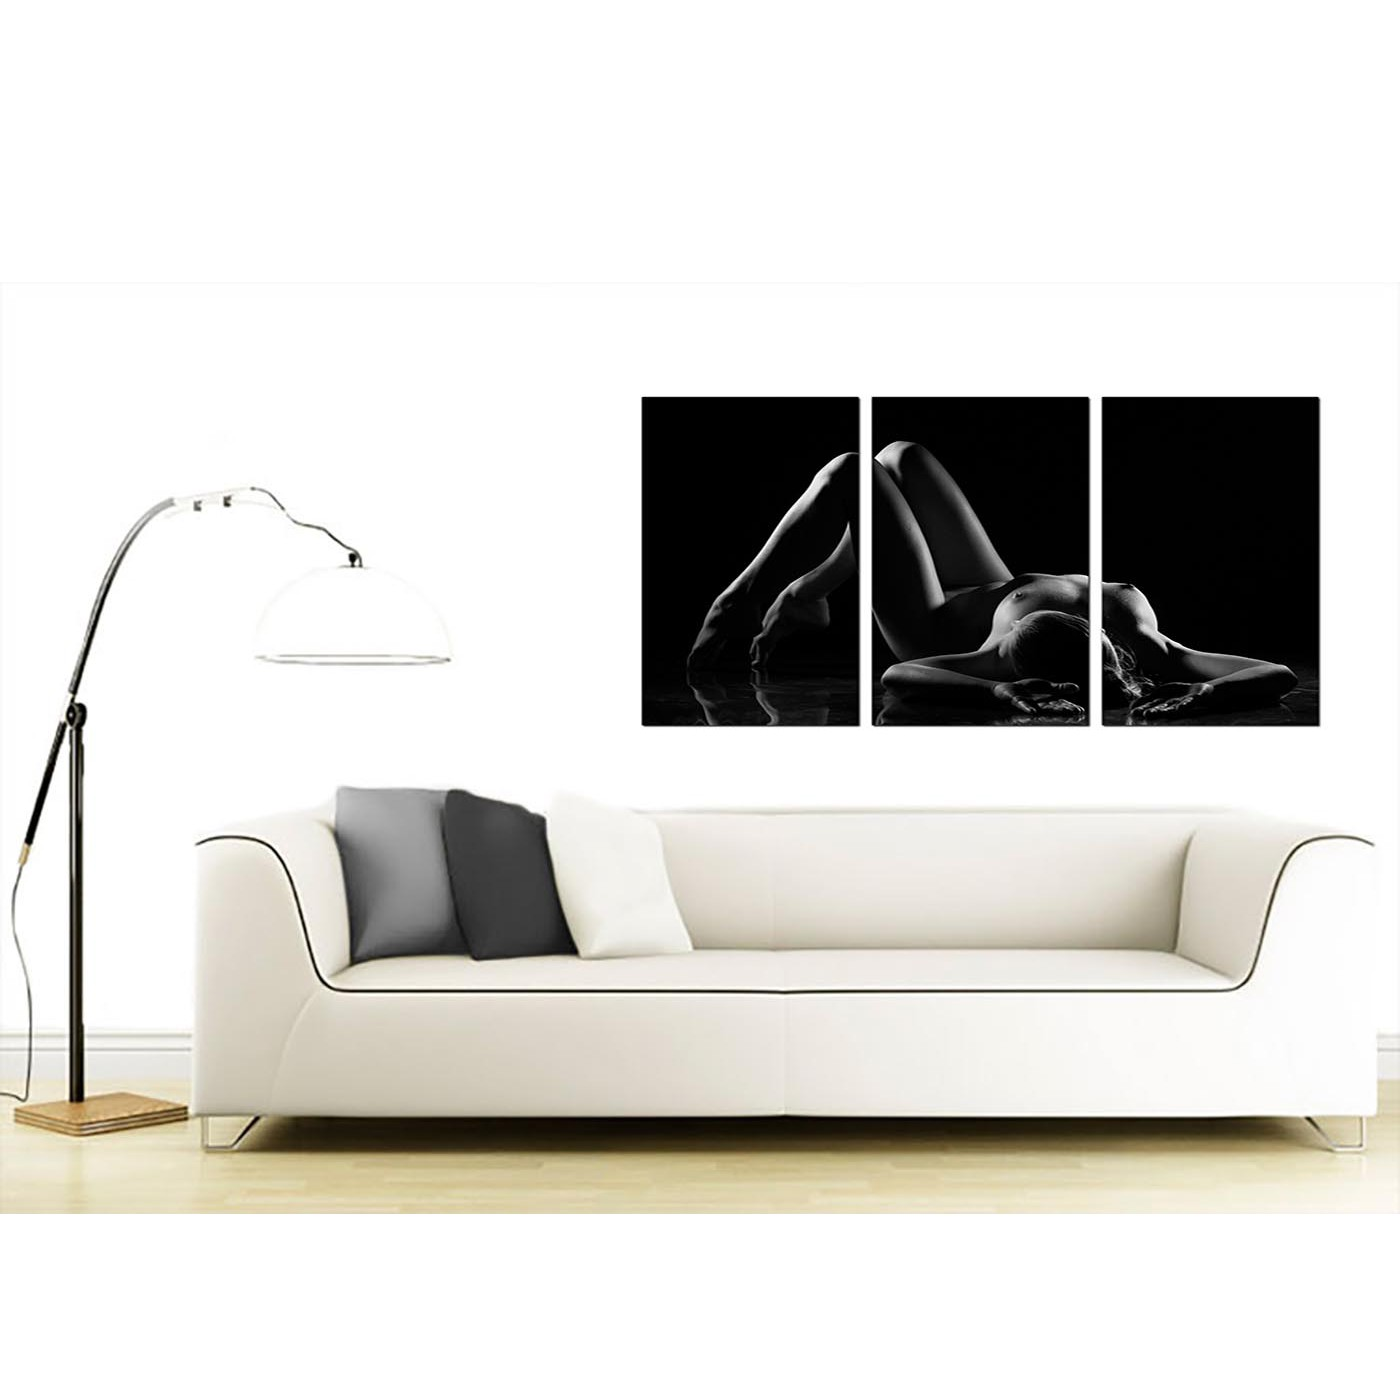 Display gallery item 4 3 panel erotic canvas prints uk 125cm x 60cm 3082 display gallery item 5